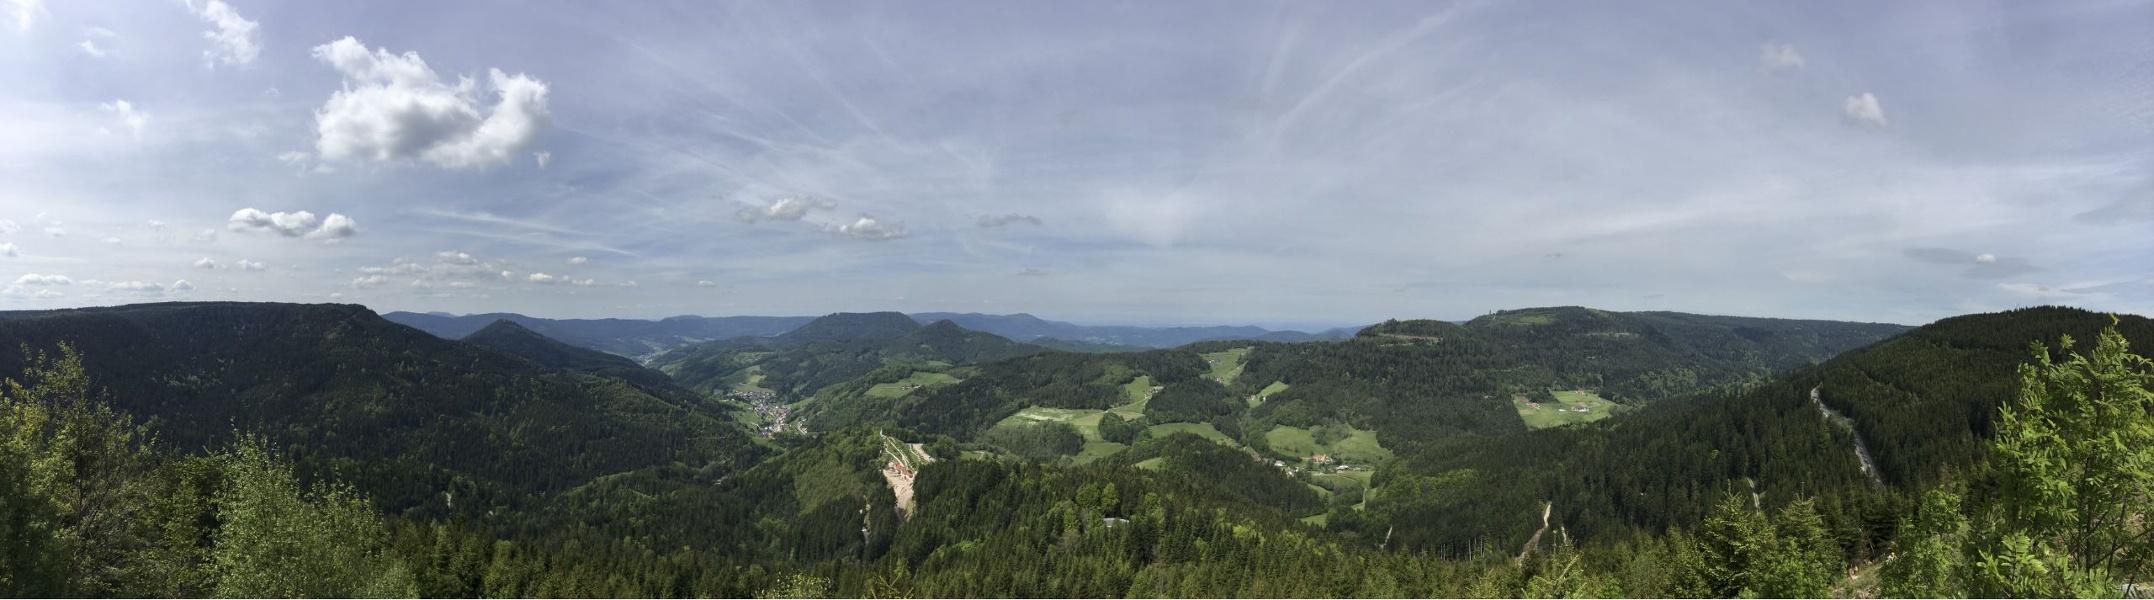 Bad Rippoldsau-Schapbach Tour 9 - Rundblick-Tour